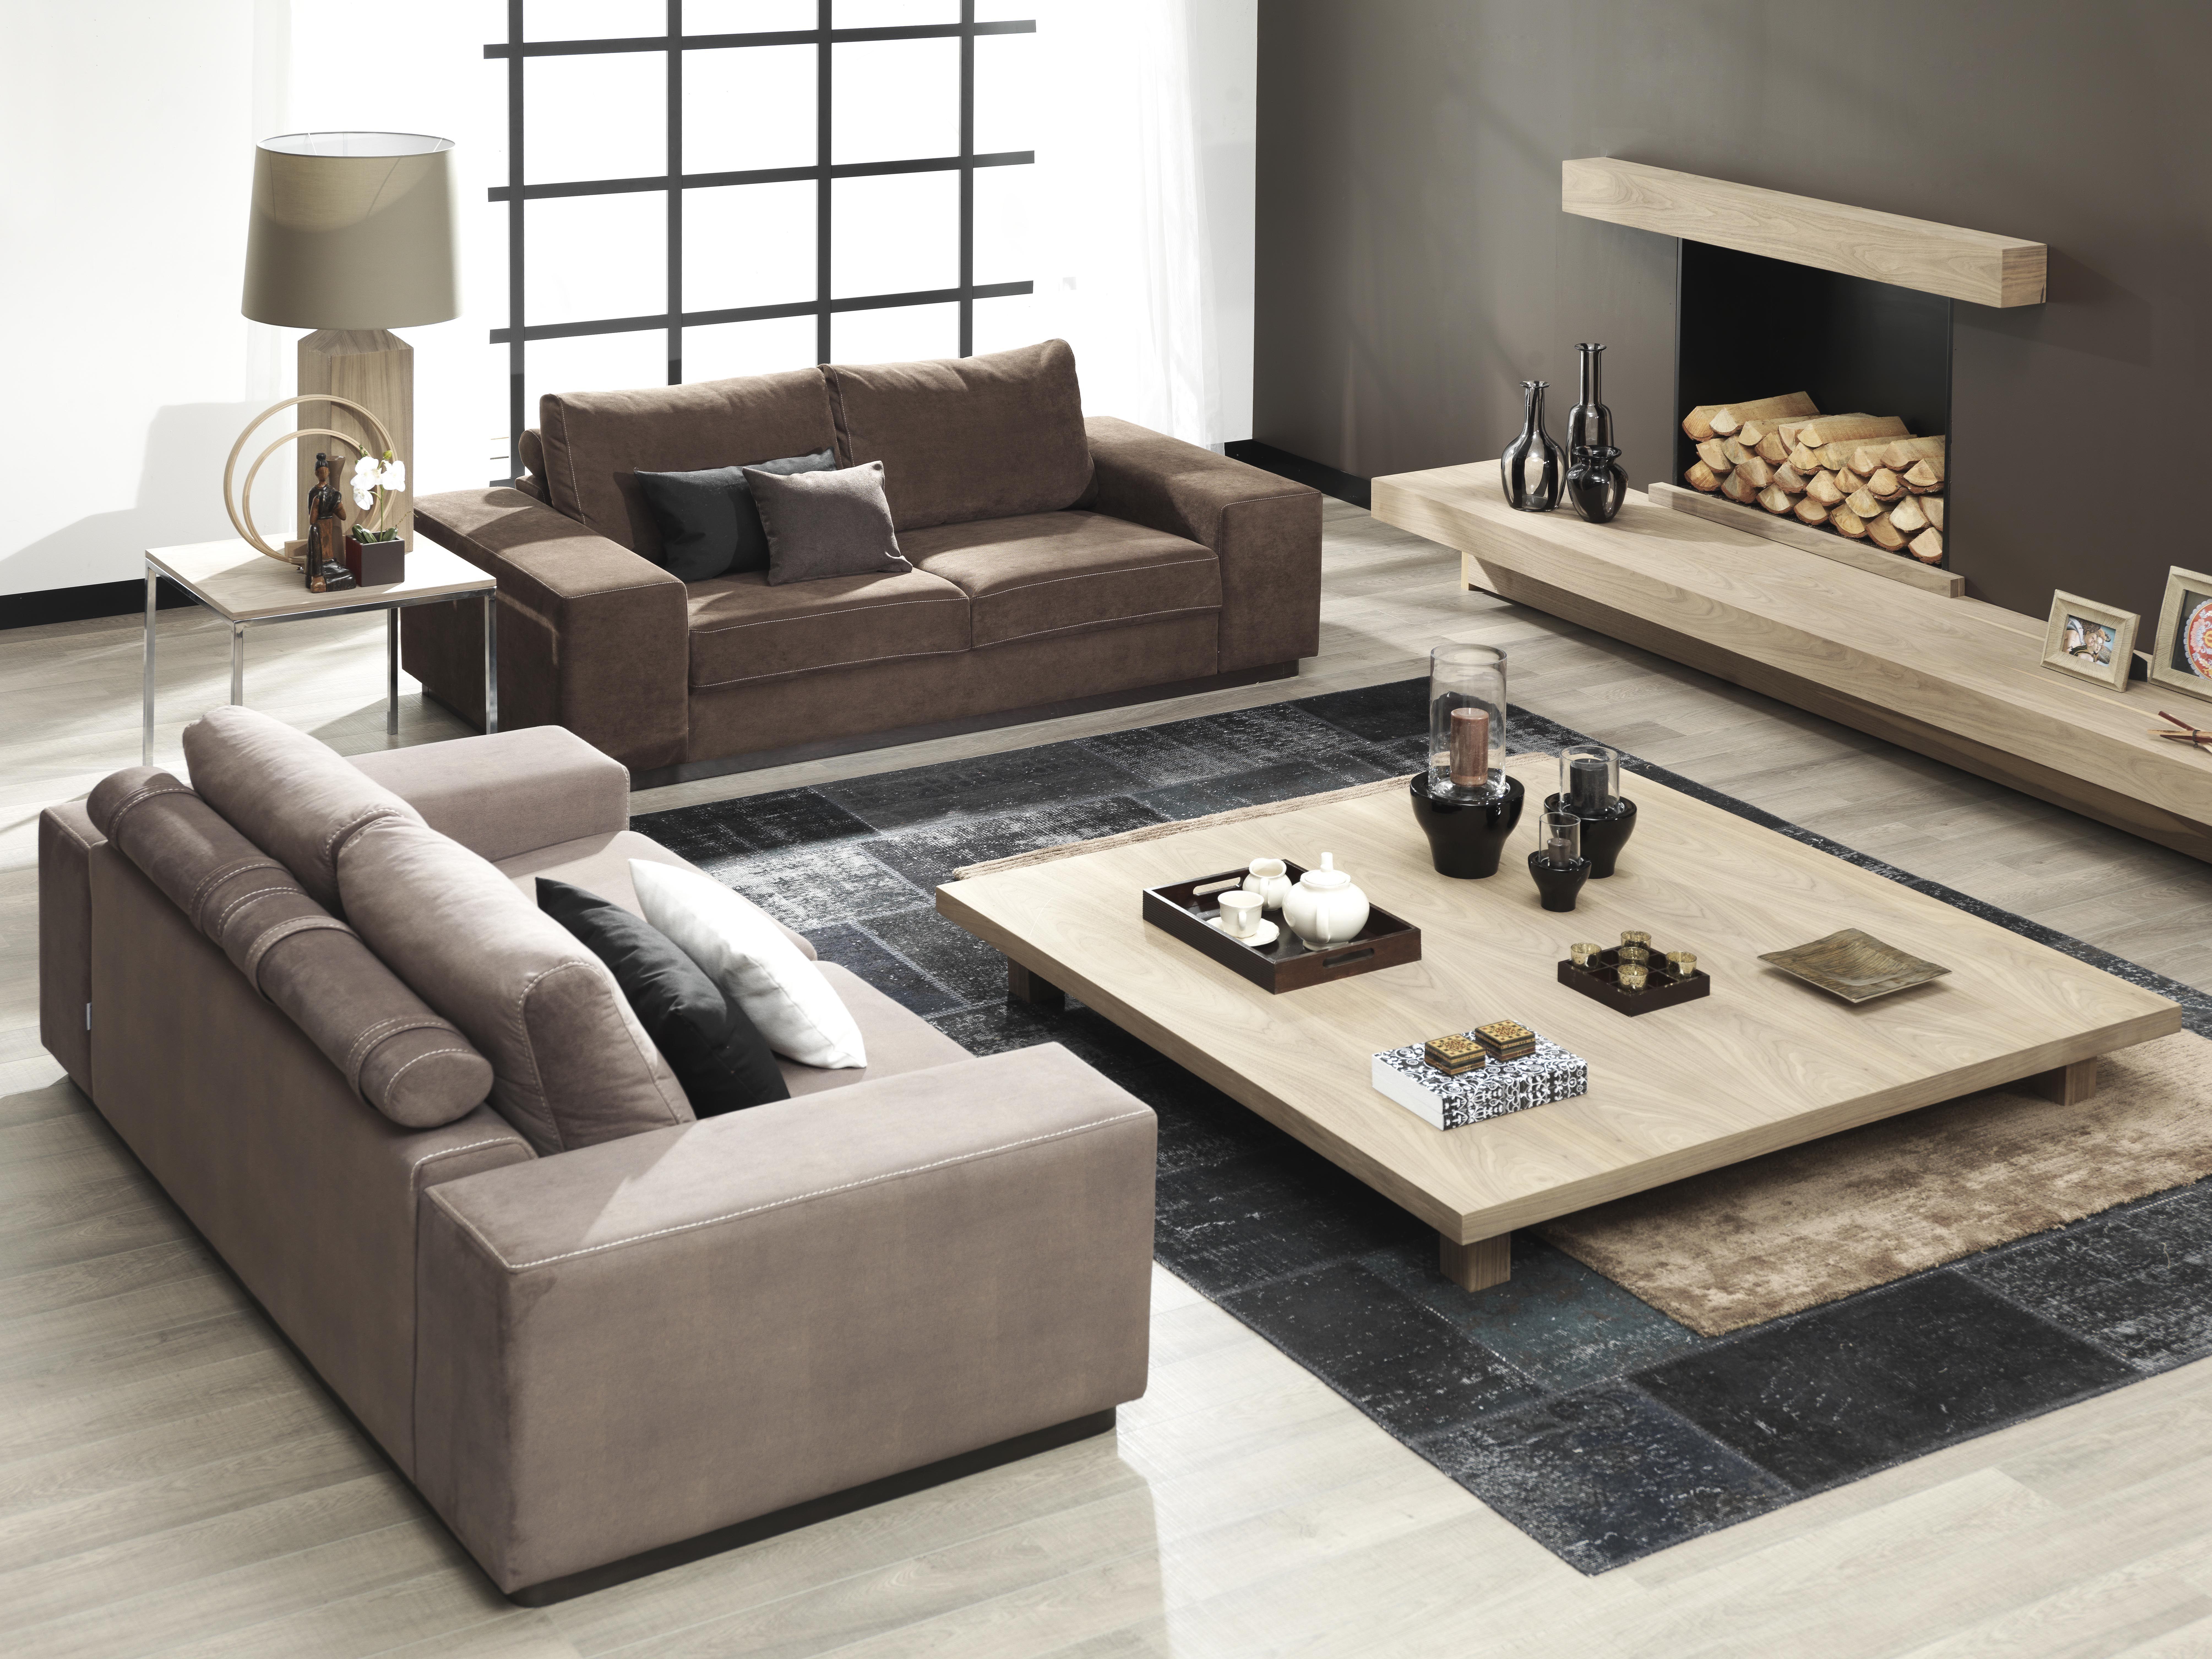 Barton Koltuk Takımı TepeHome salontakimi koltuk kanepe